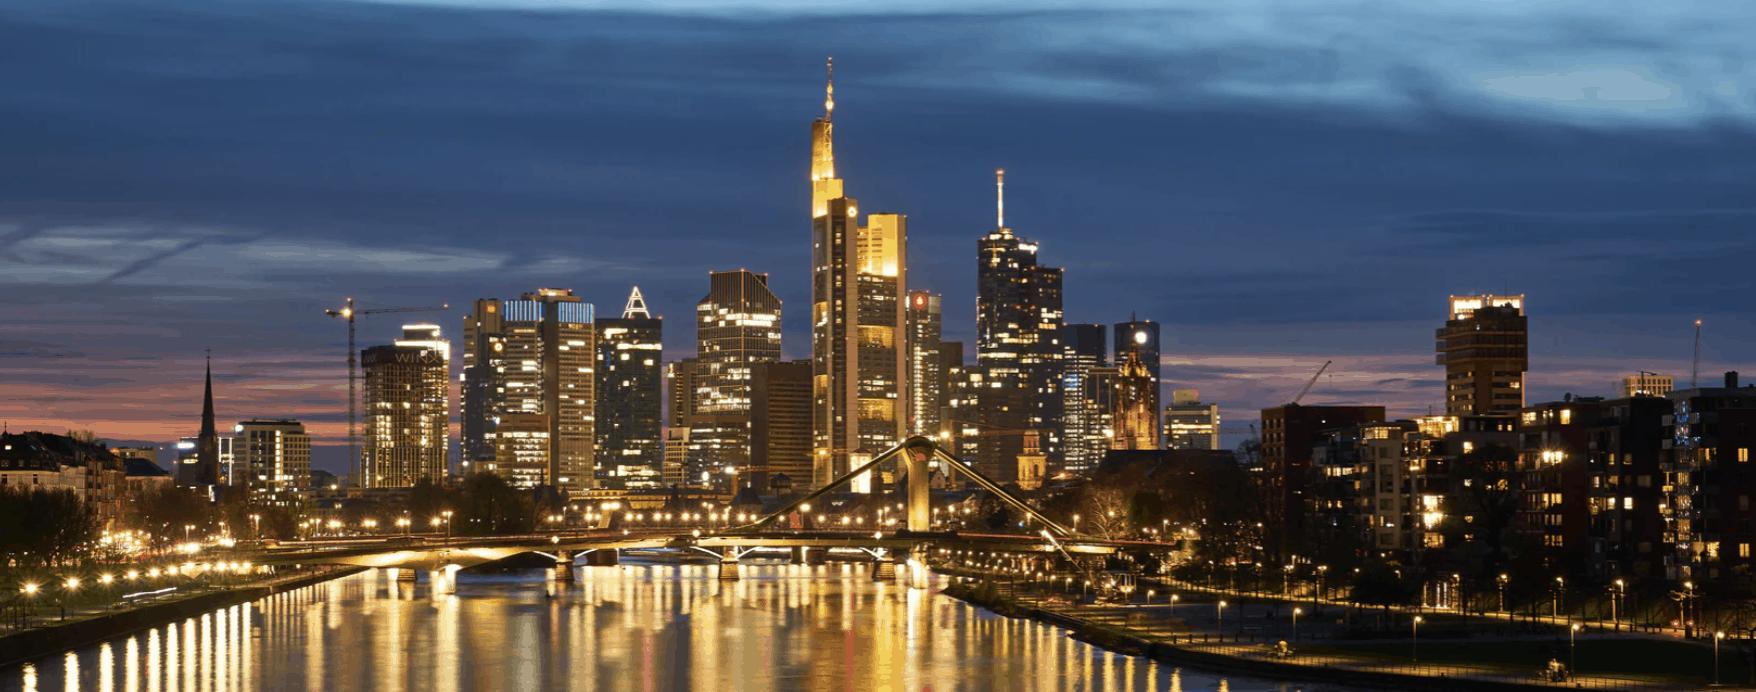 größte immobilienmakler frankfurt liste